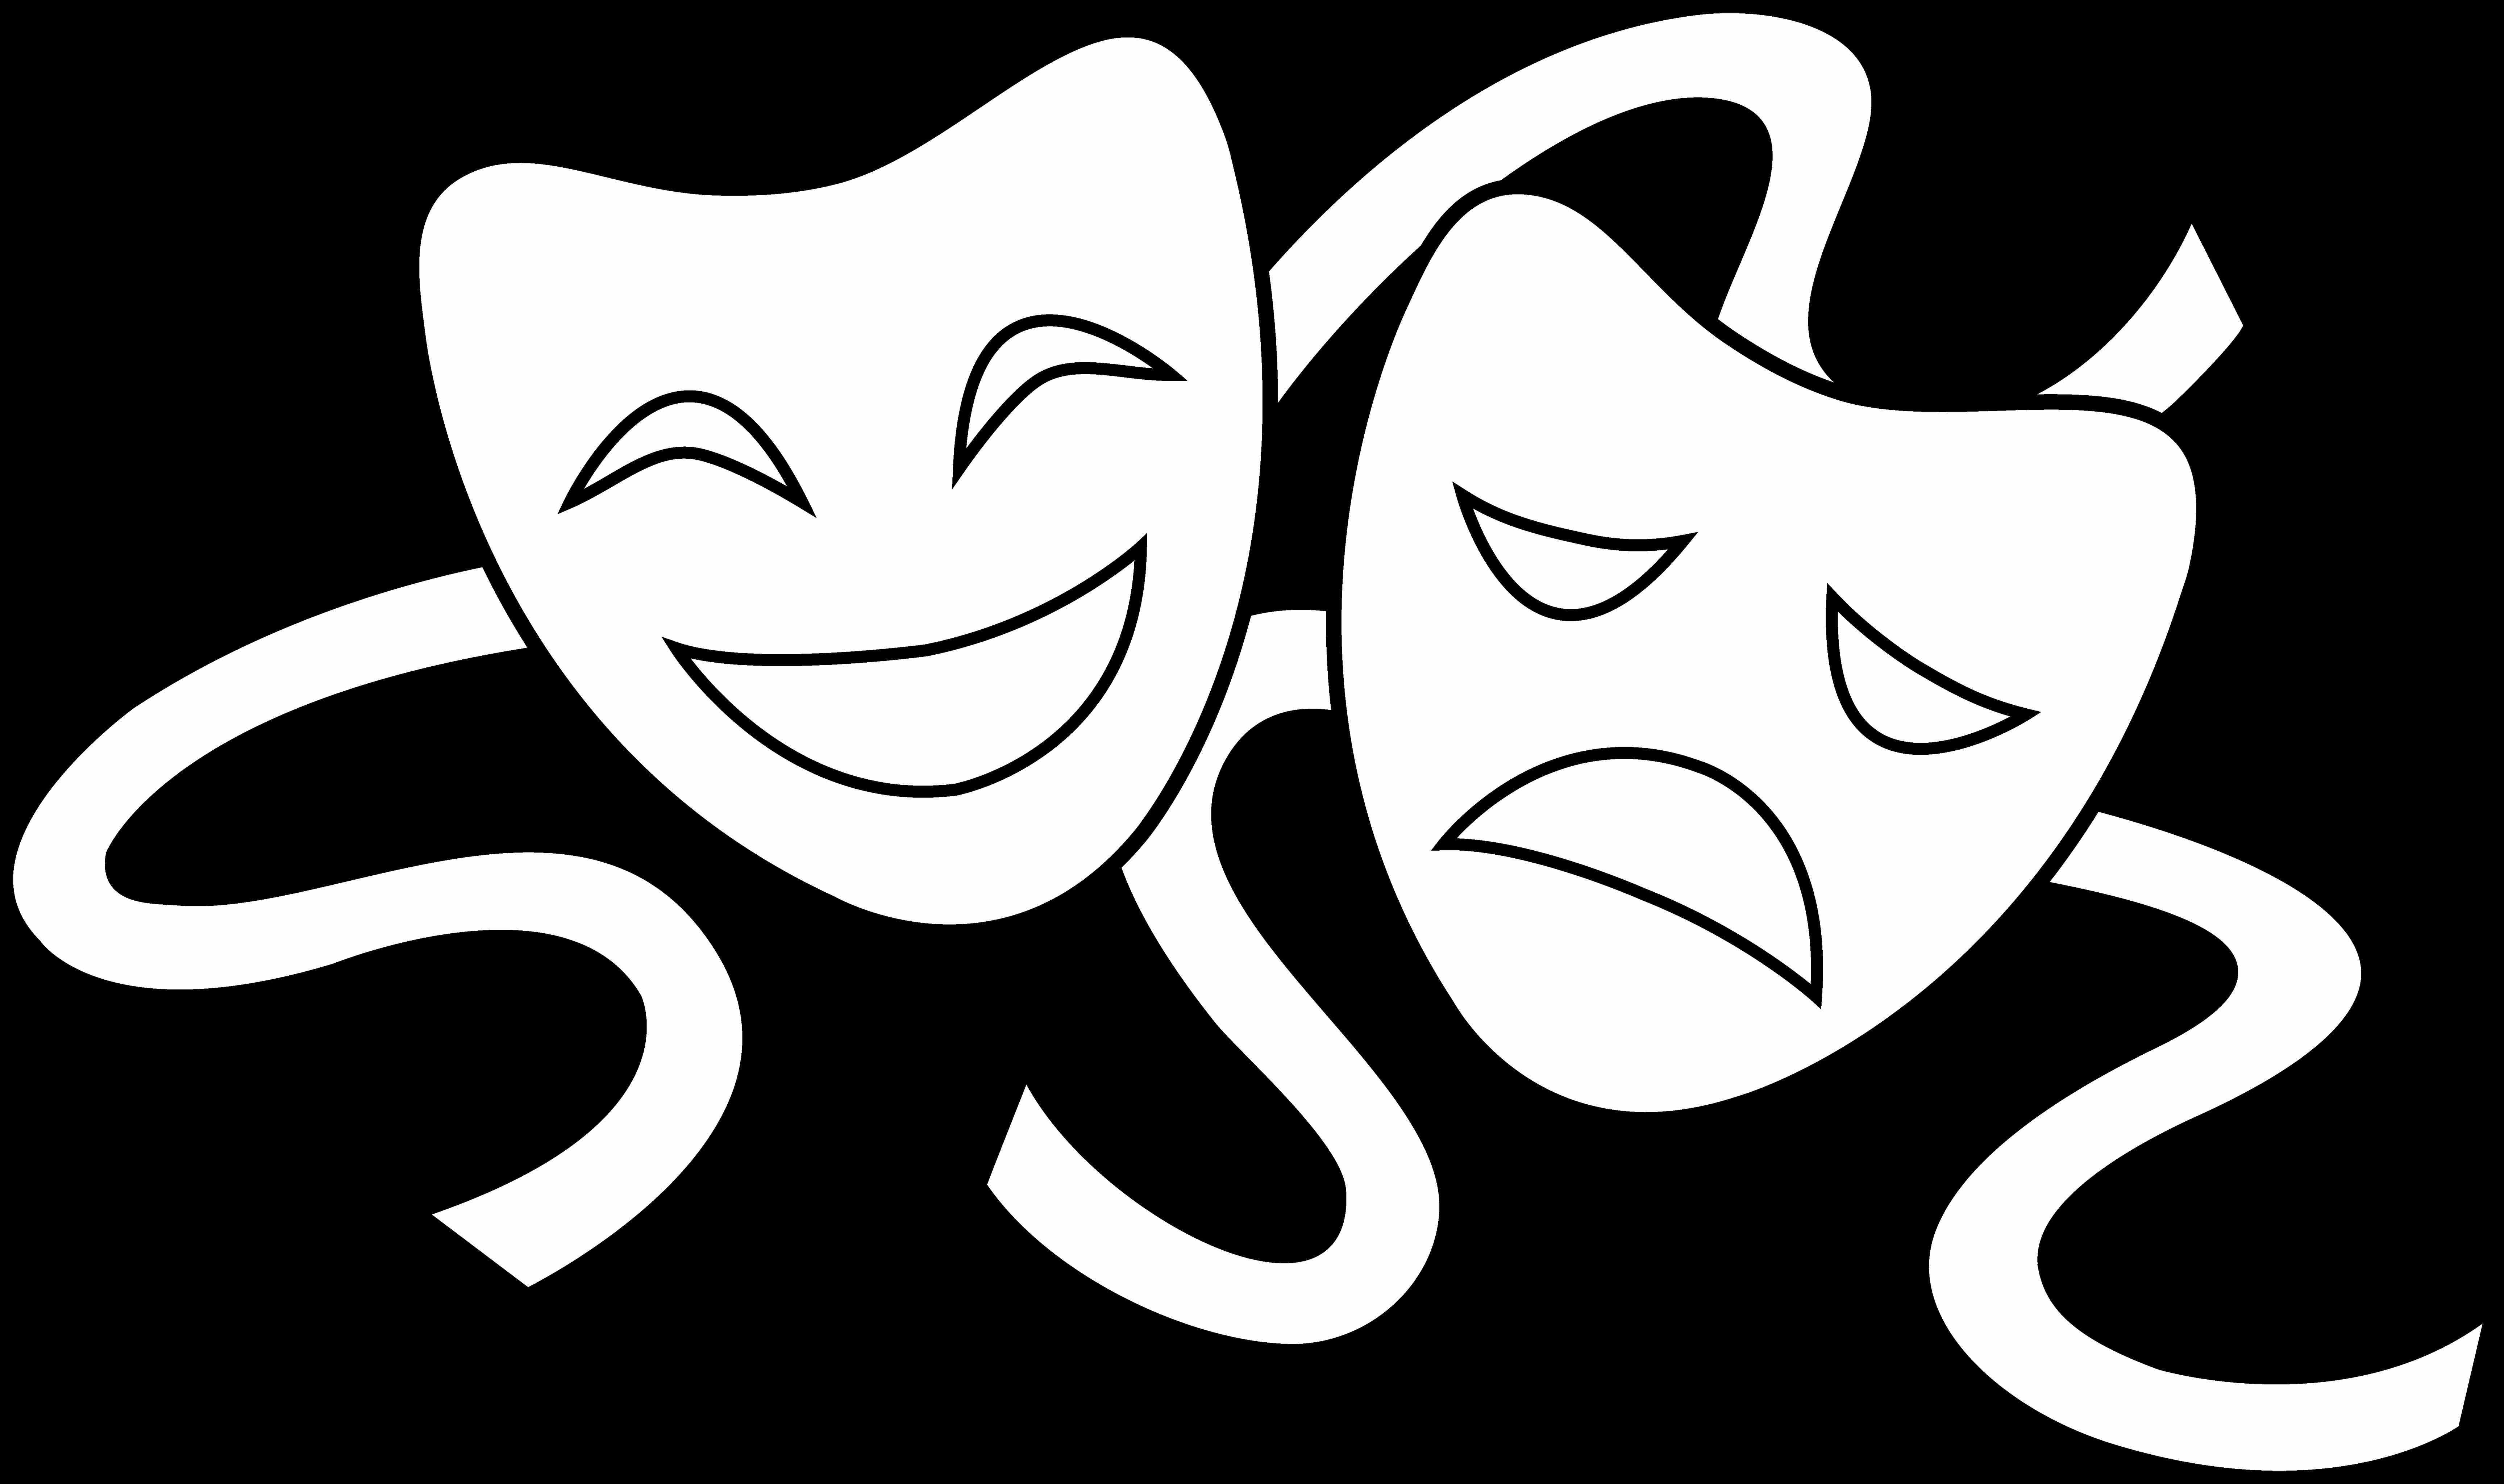 6910x4096 Drama Masks Drawings